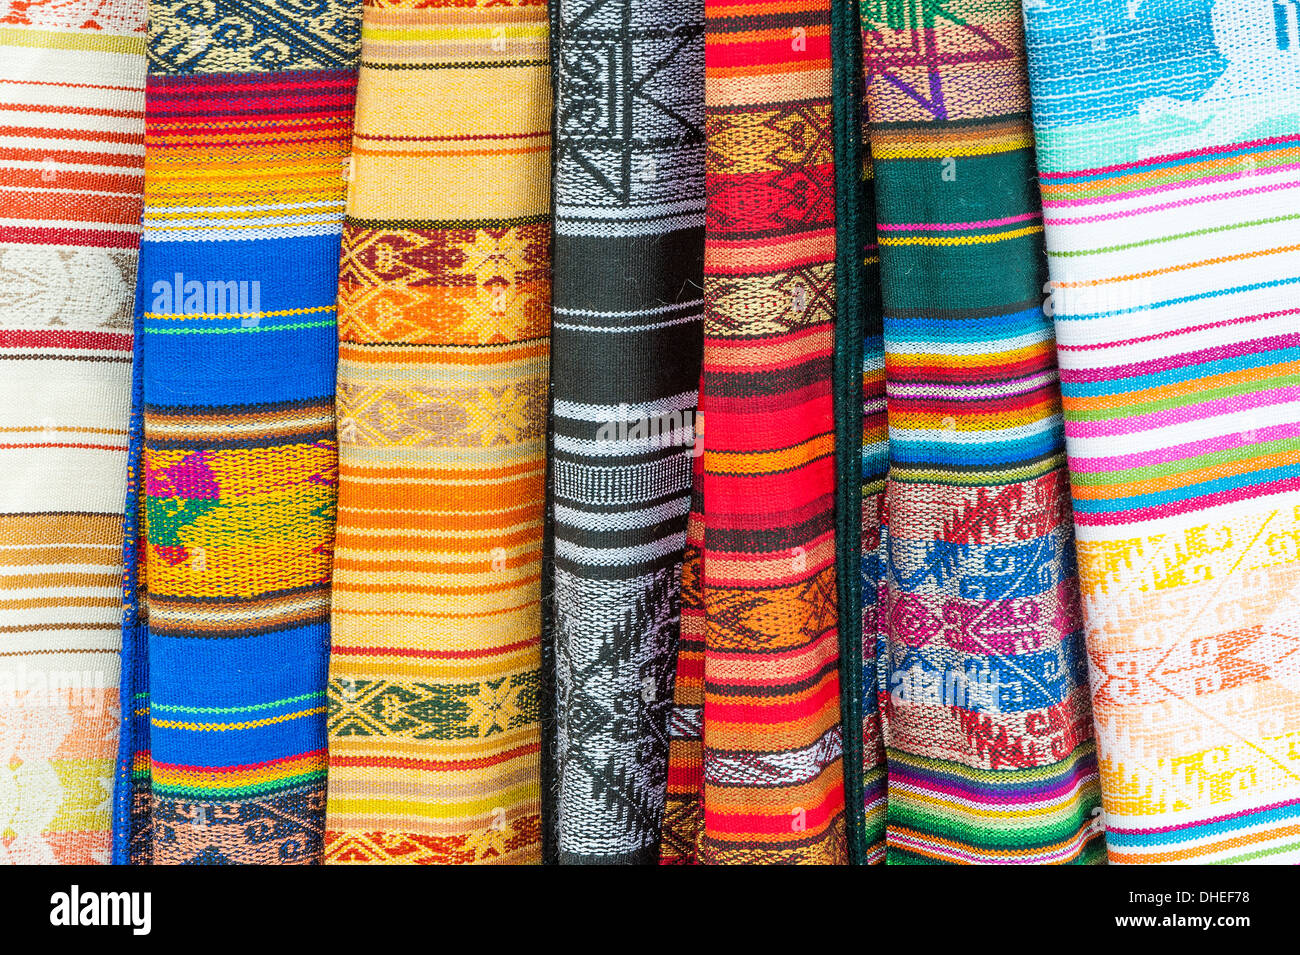 Otavalo market, traditional colourful textiles, Imbabura Province, Ecuador - Stock Image